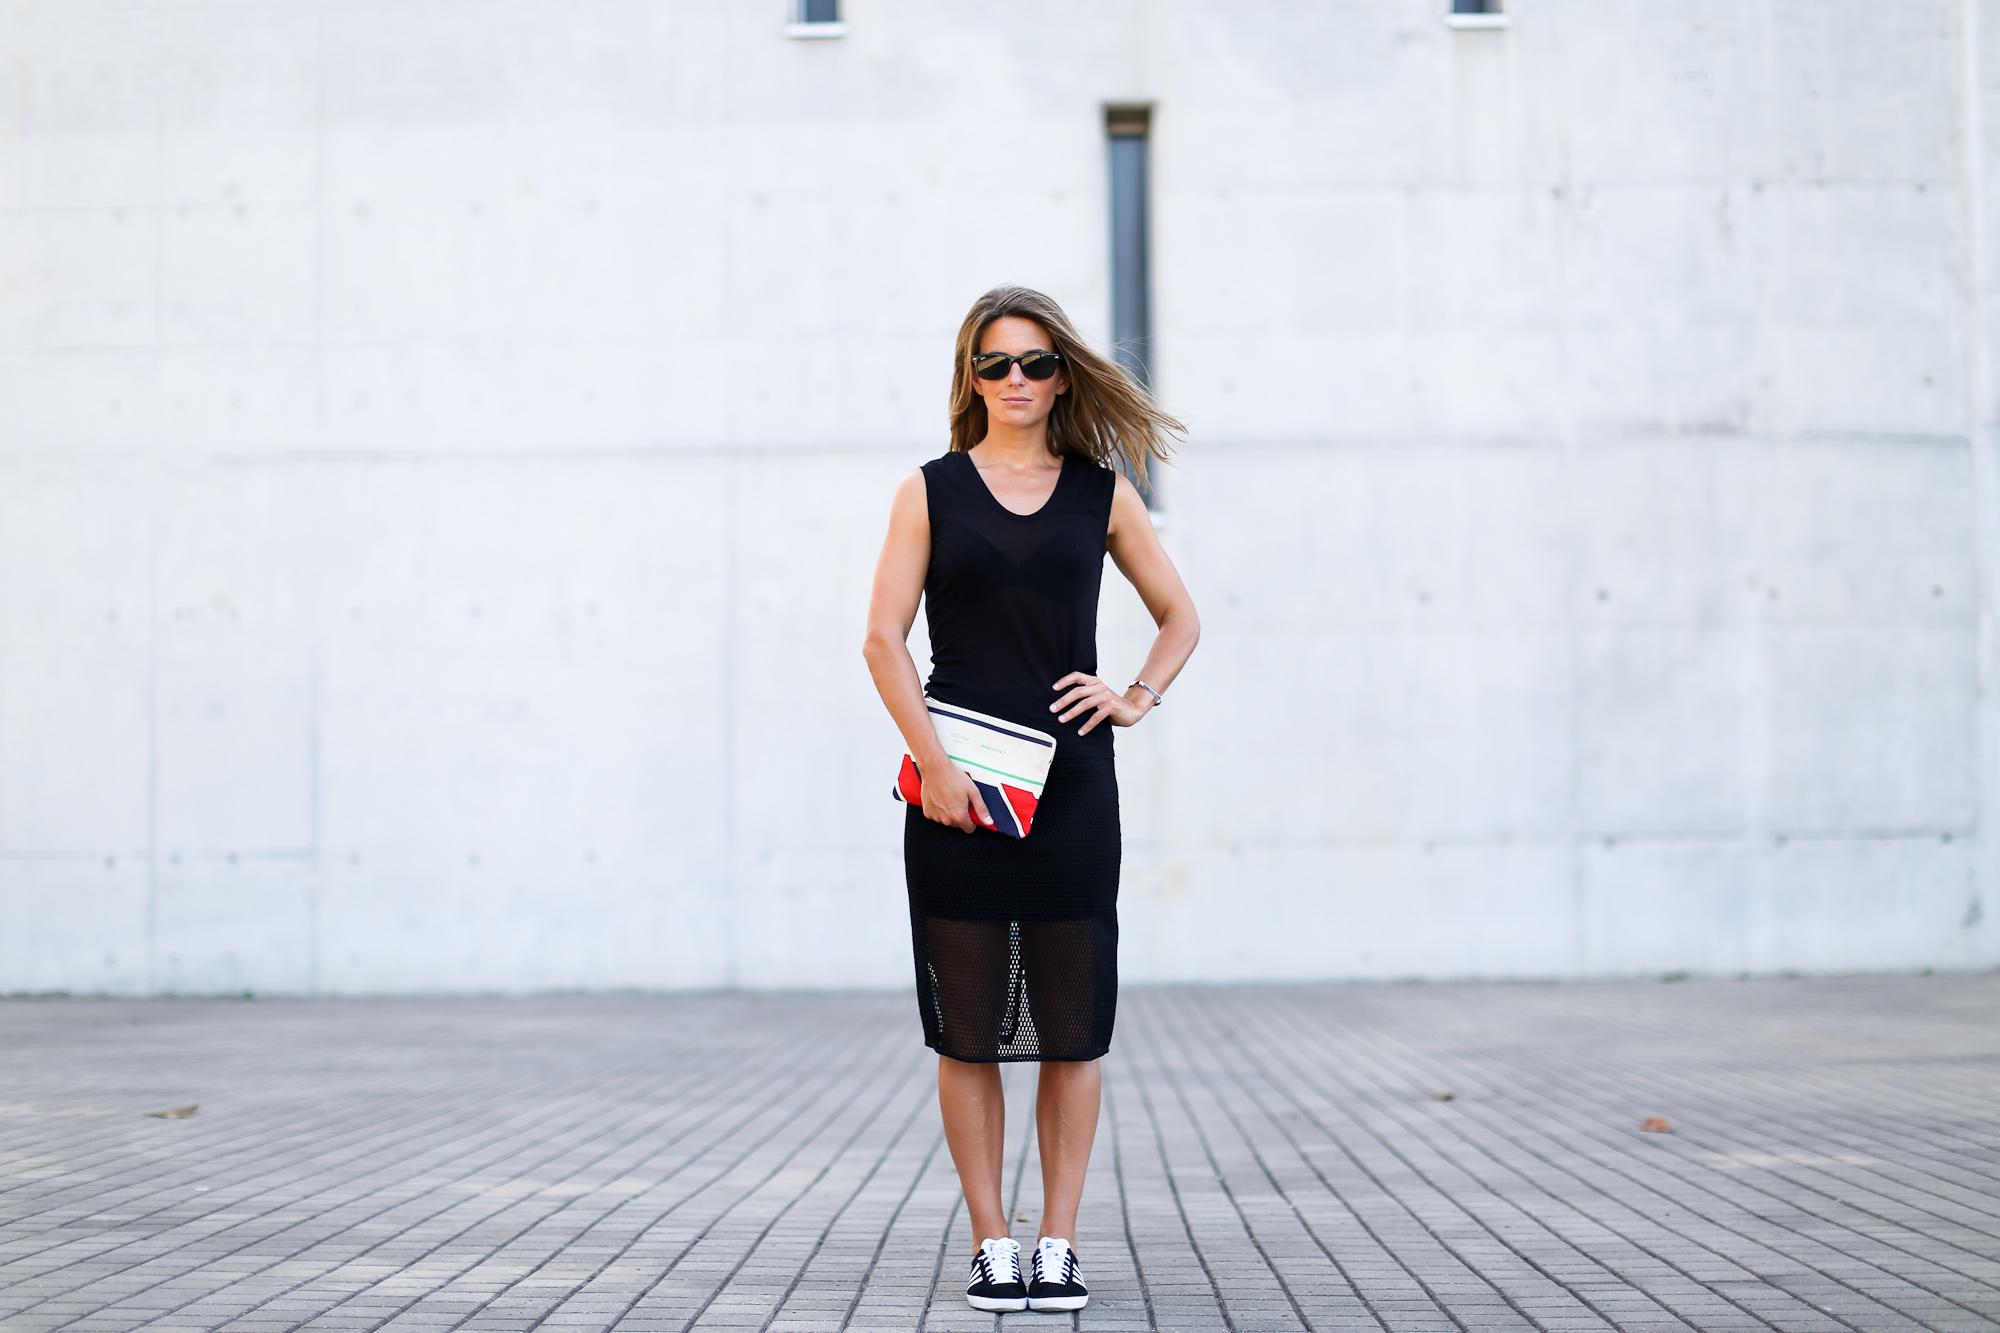 Clochet_streetstyle_adidas_gazelle_black_leztinstreet_celine_paris_clutch